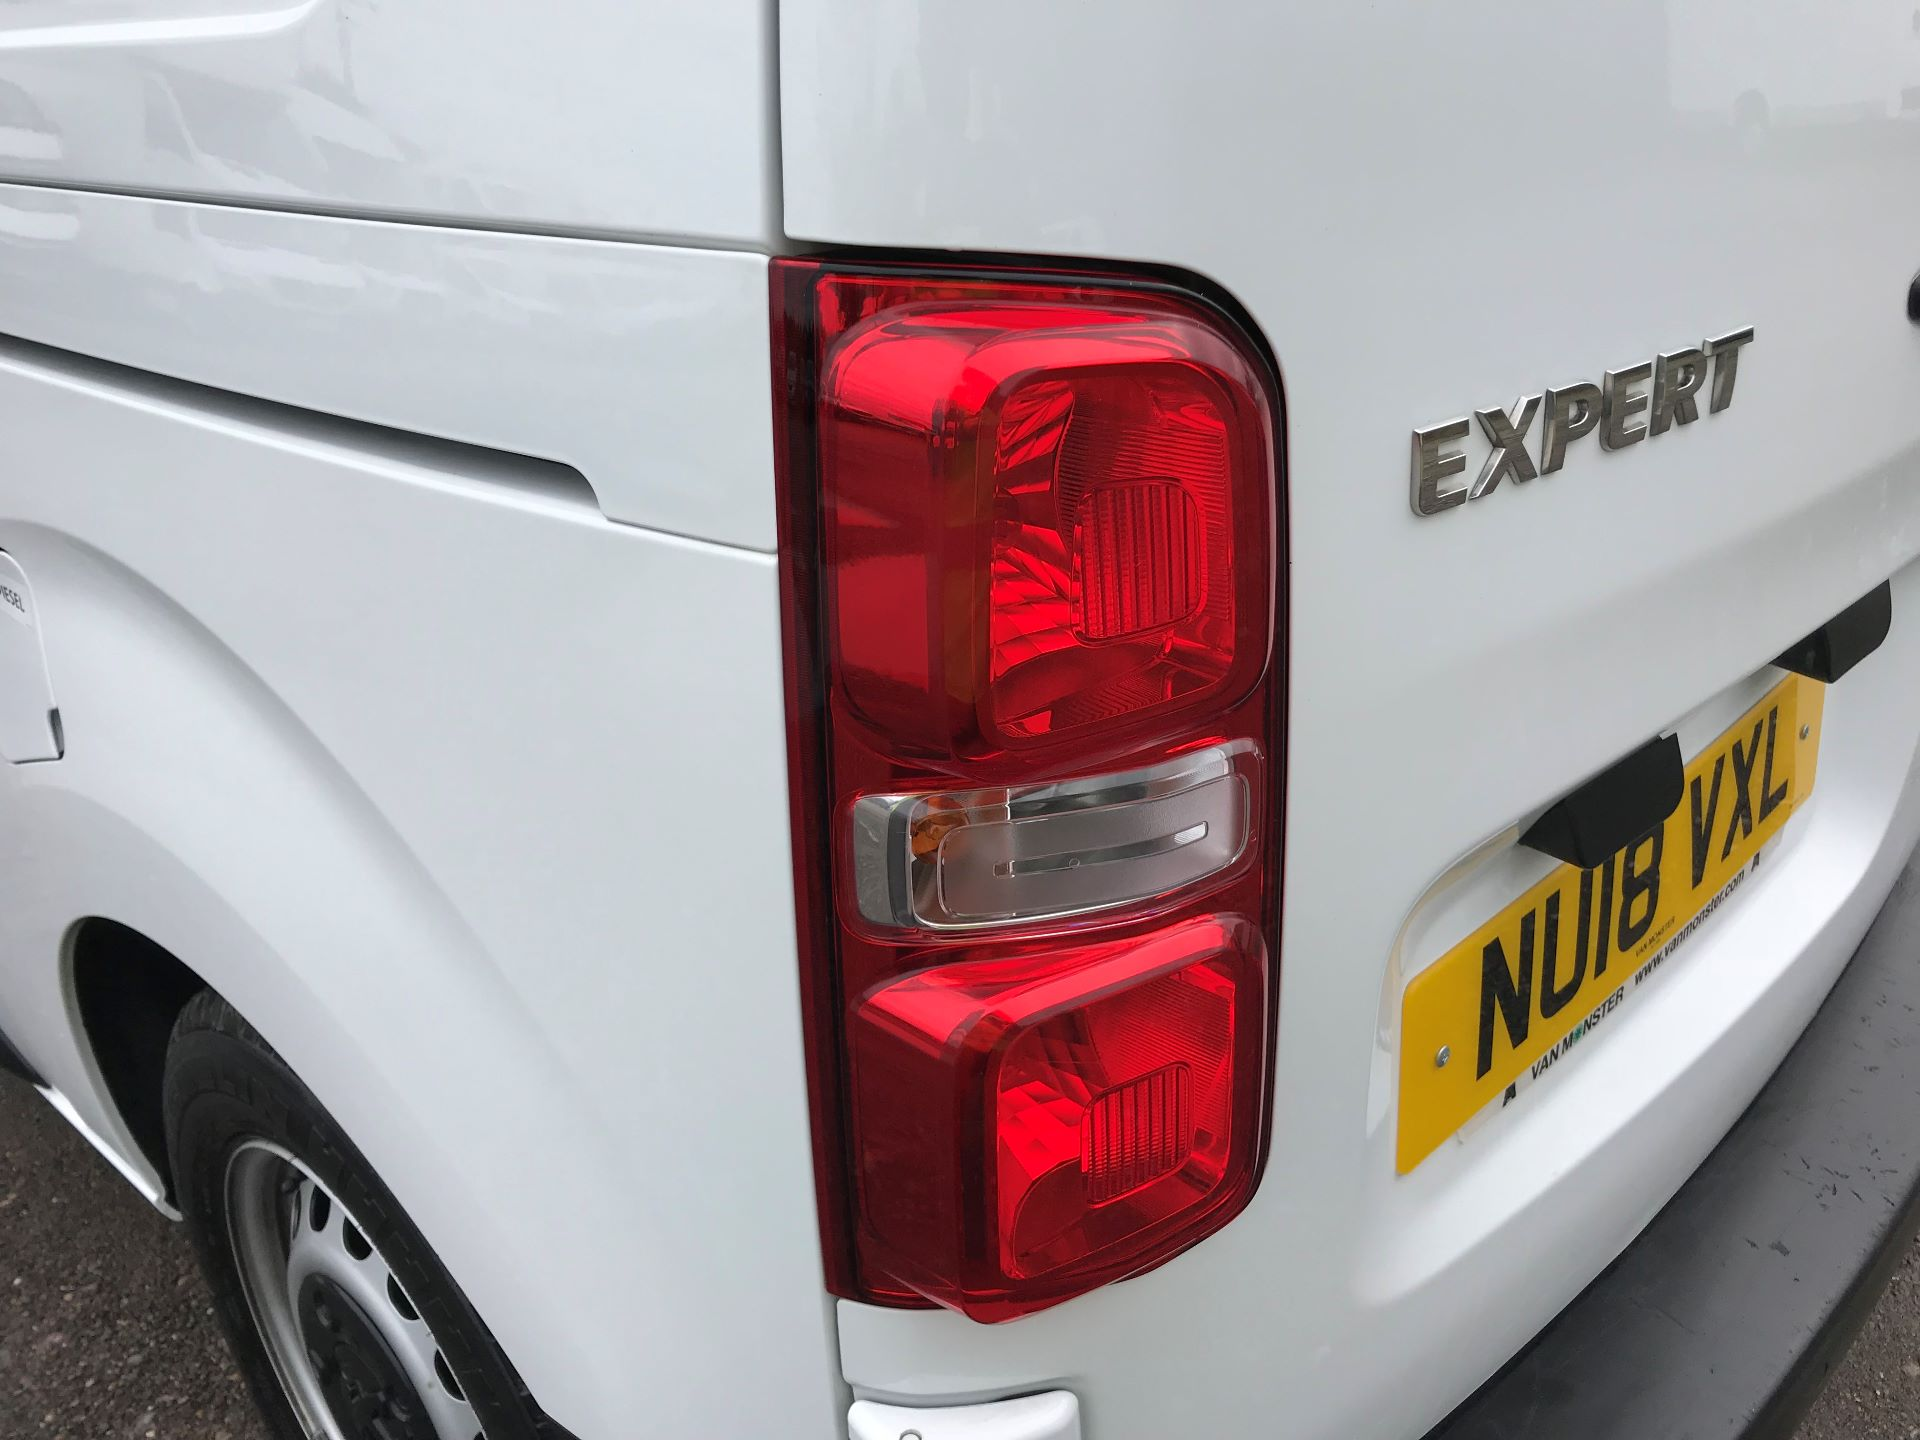 2018 Peugeot Expert STANDARD 1000 1.6 BLUEHDI 95 PROFESSIONAL EURO 6 (NU18VXL) Image 36